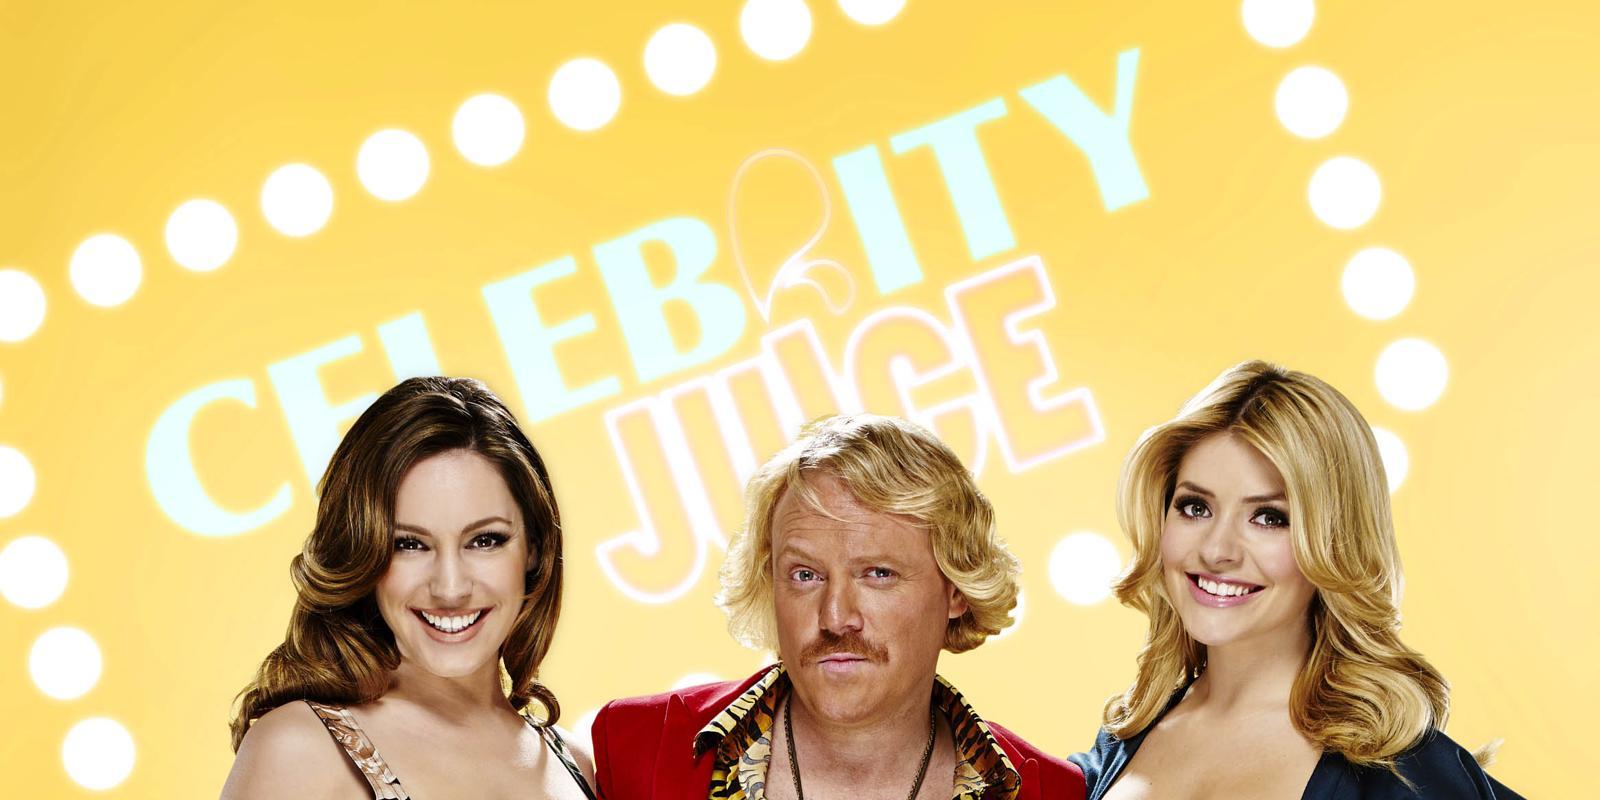 Watch Celebrity Juice online - Series Free